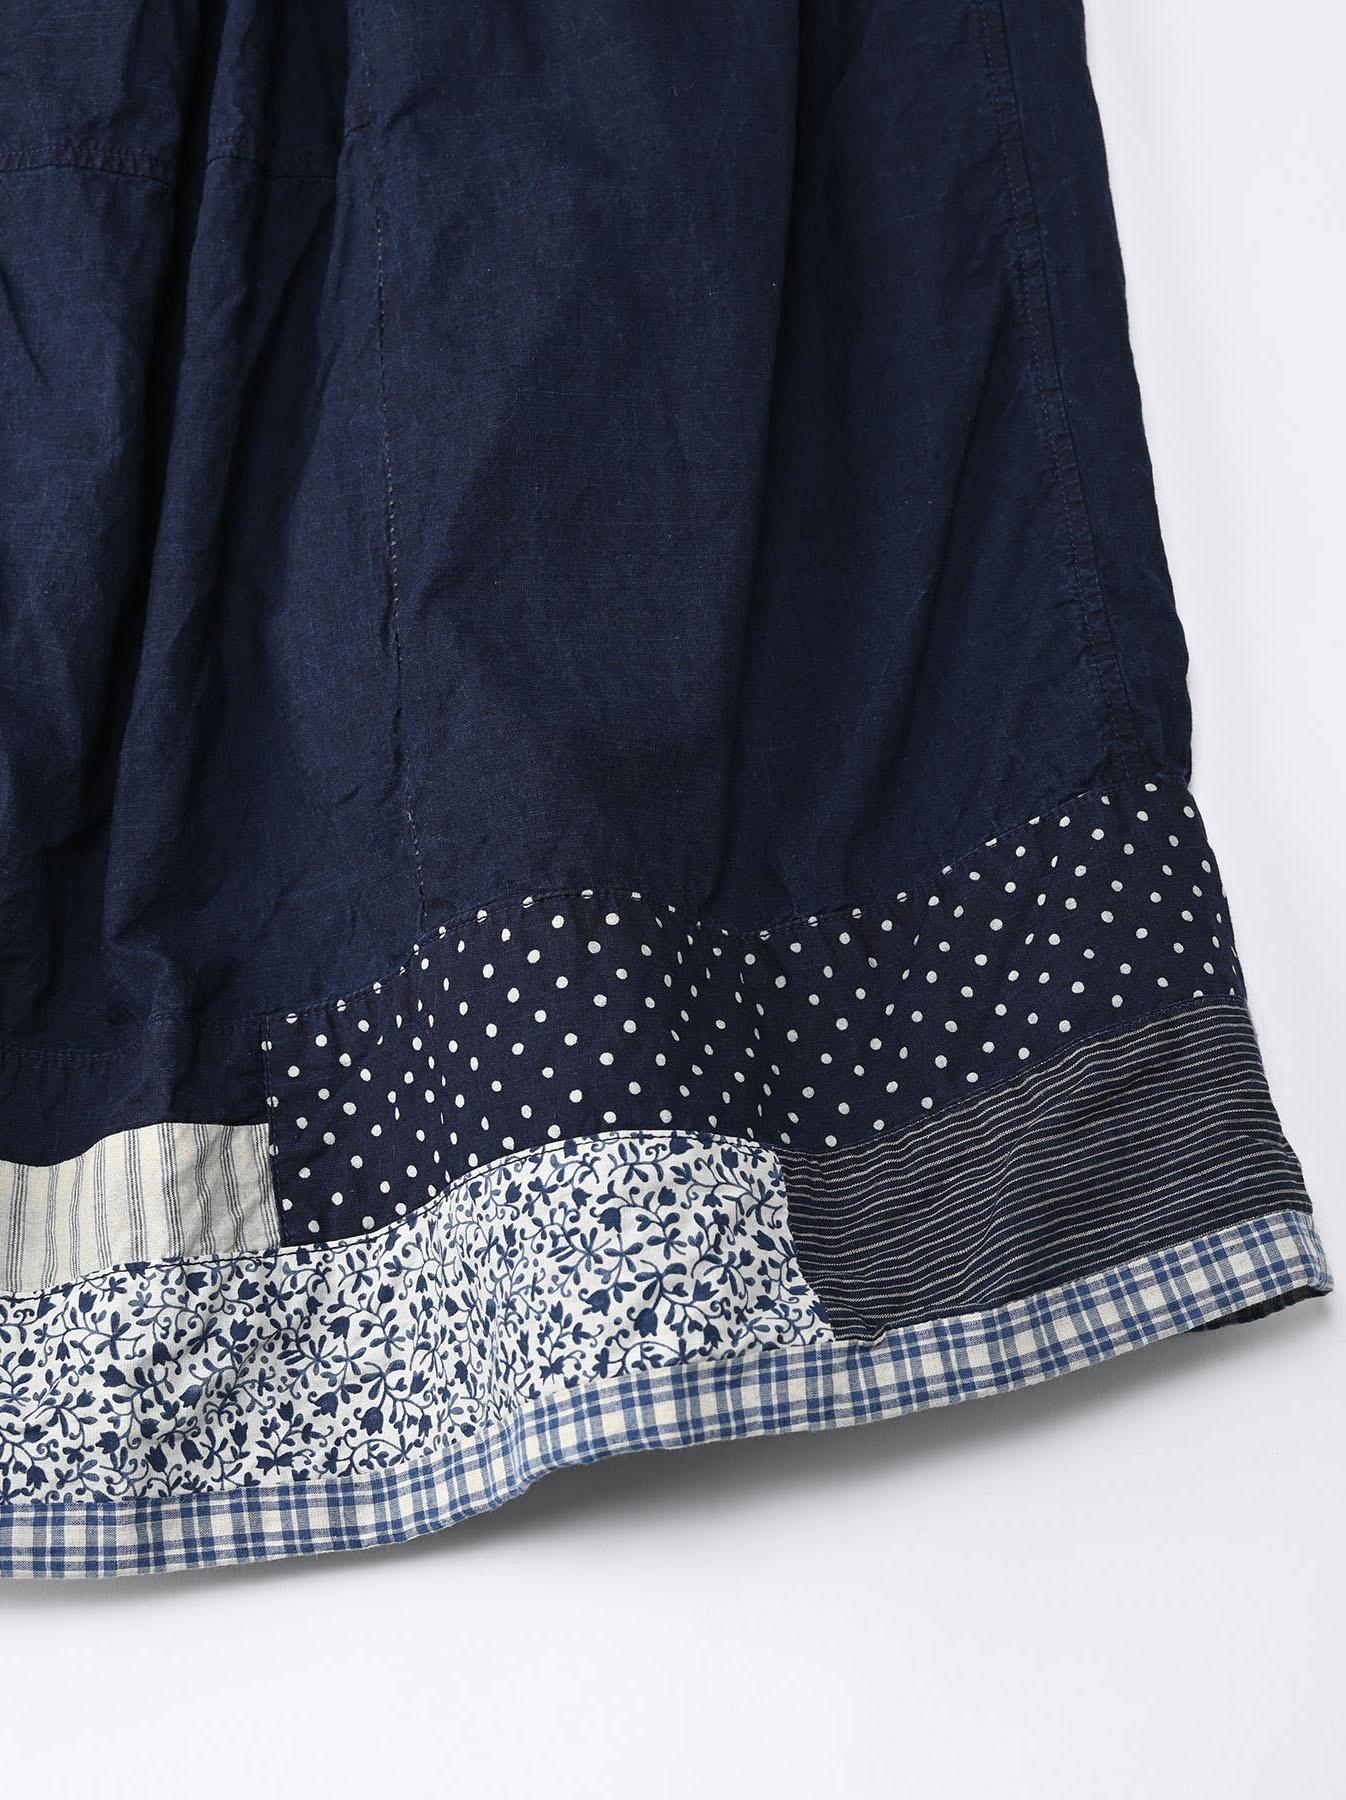 Indigo Tappet Patchwork Skirt-9